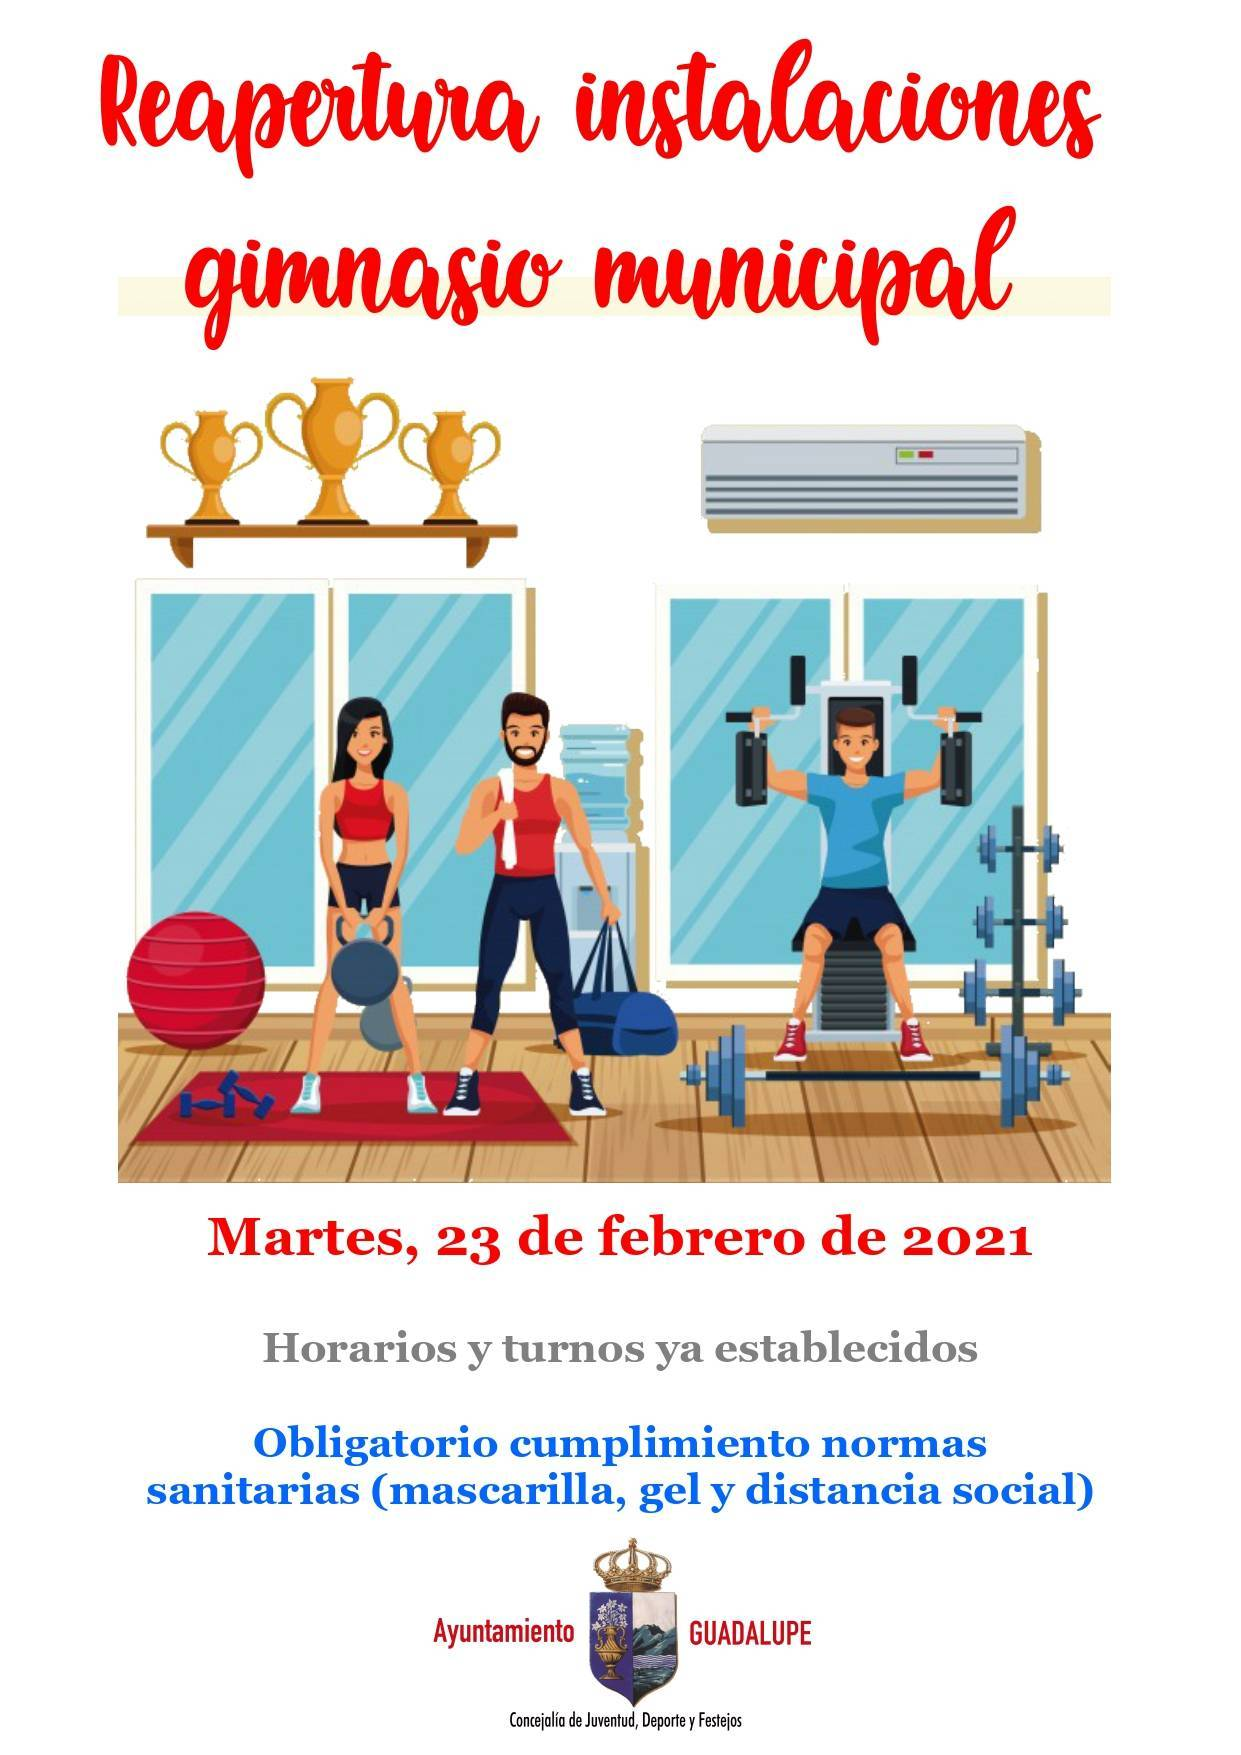 Reapertura del gimnasio municipal (febrero 2021) - Guadalupe (Cáceres)